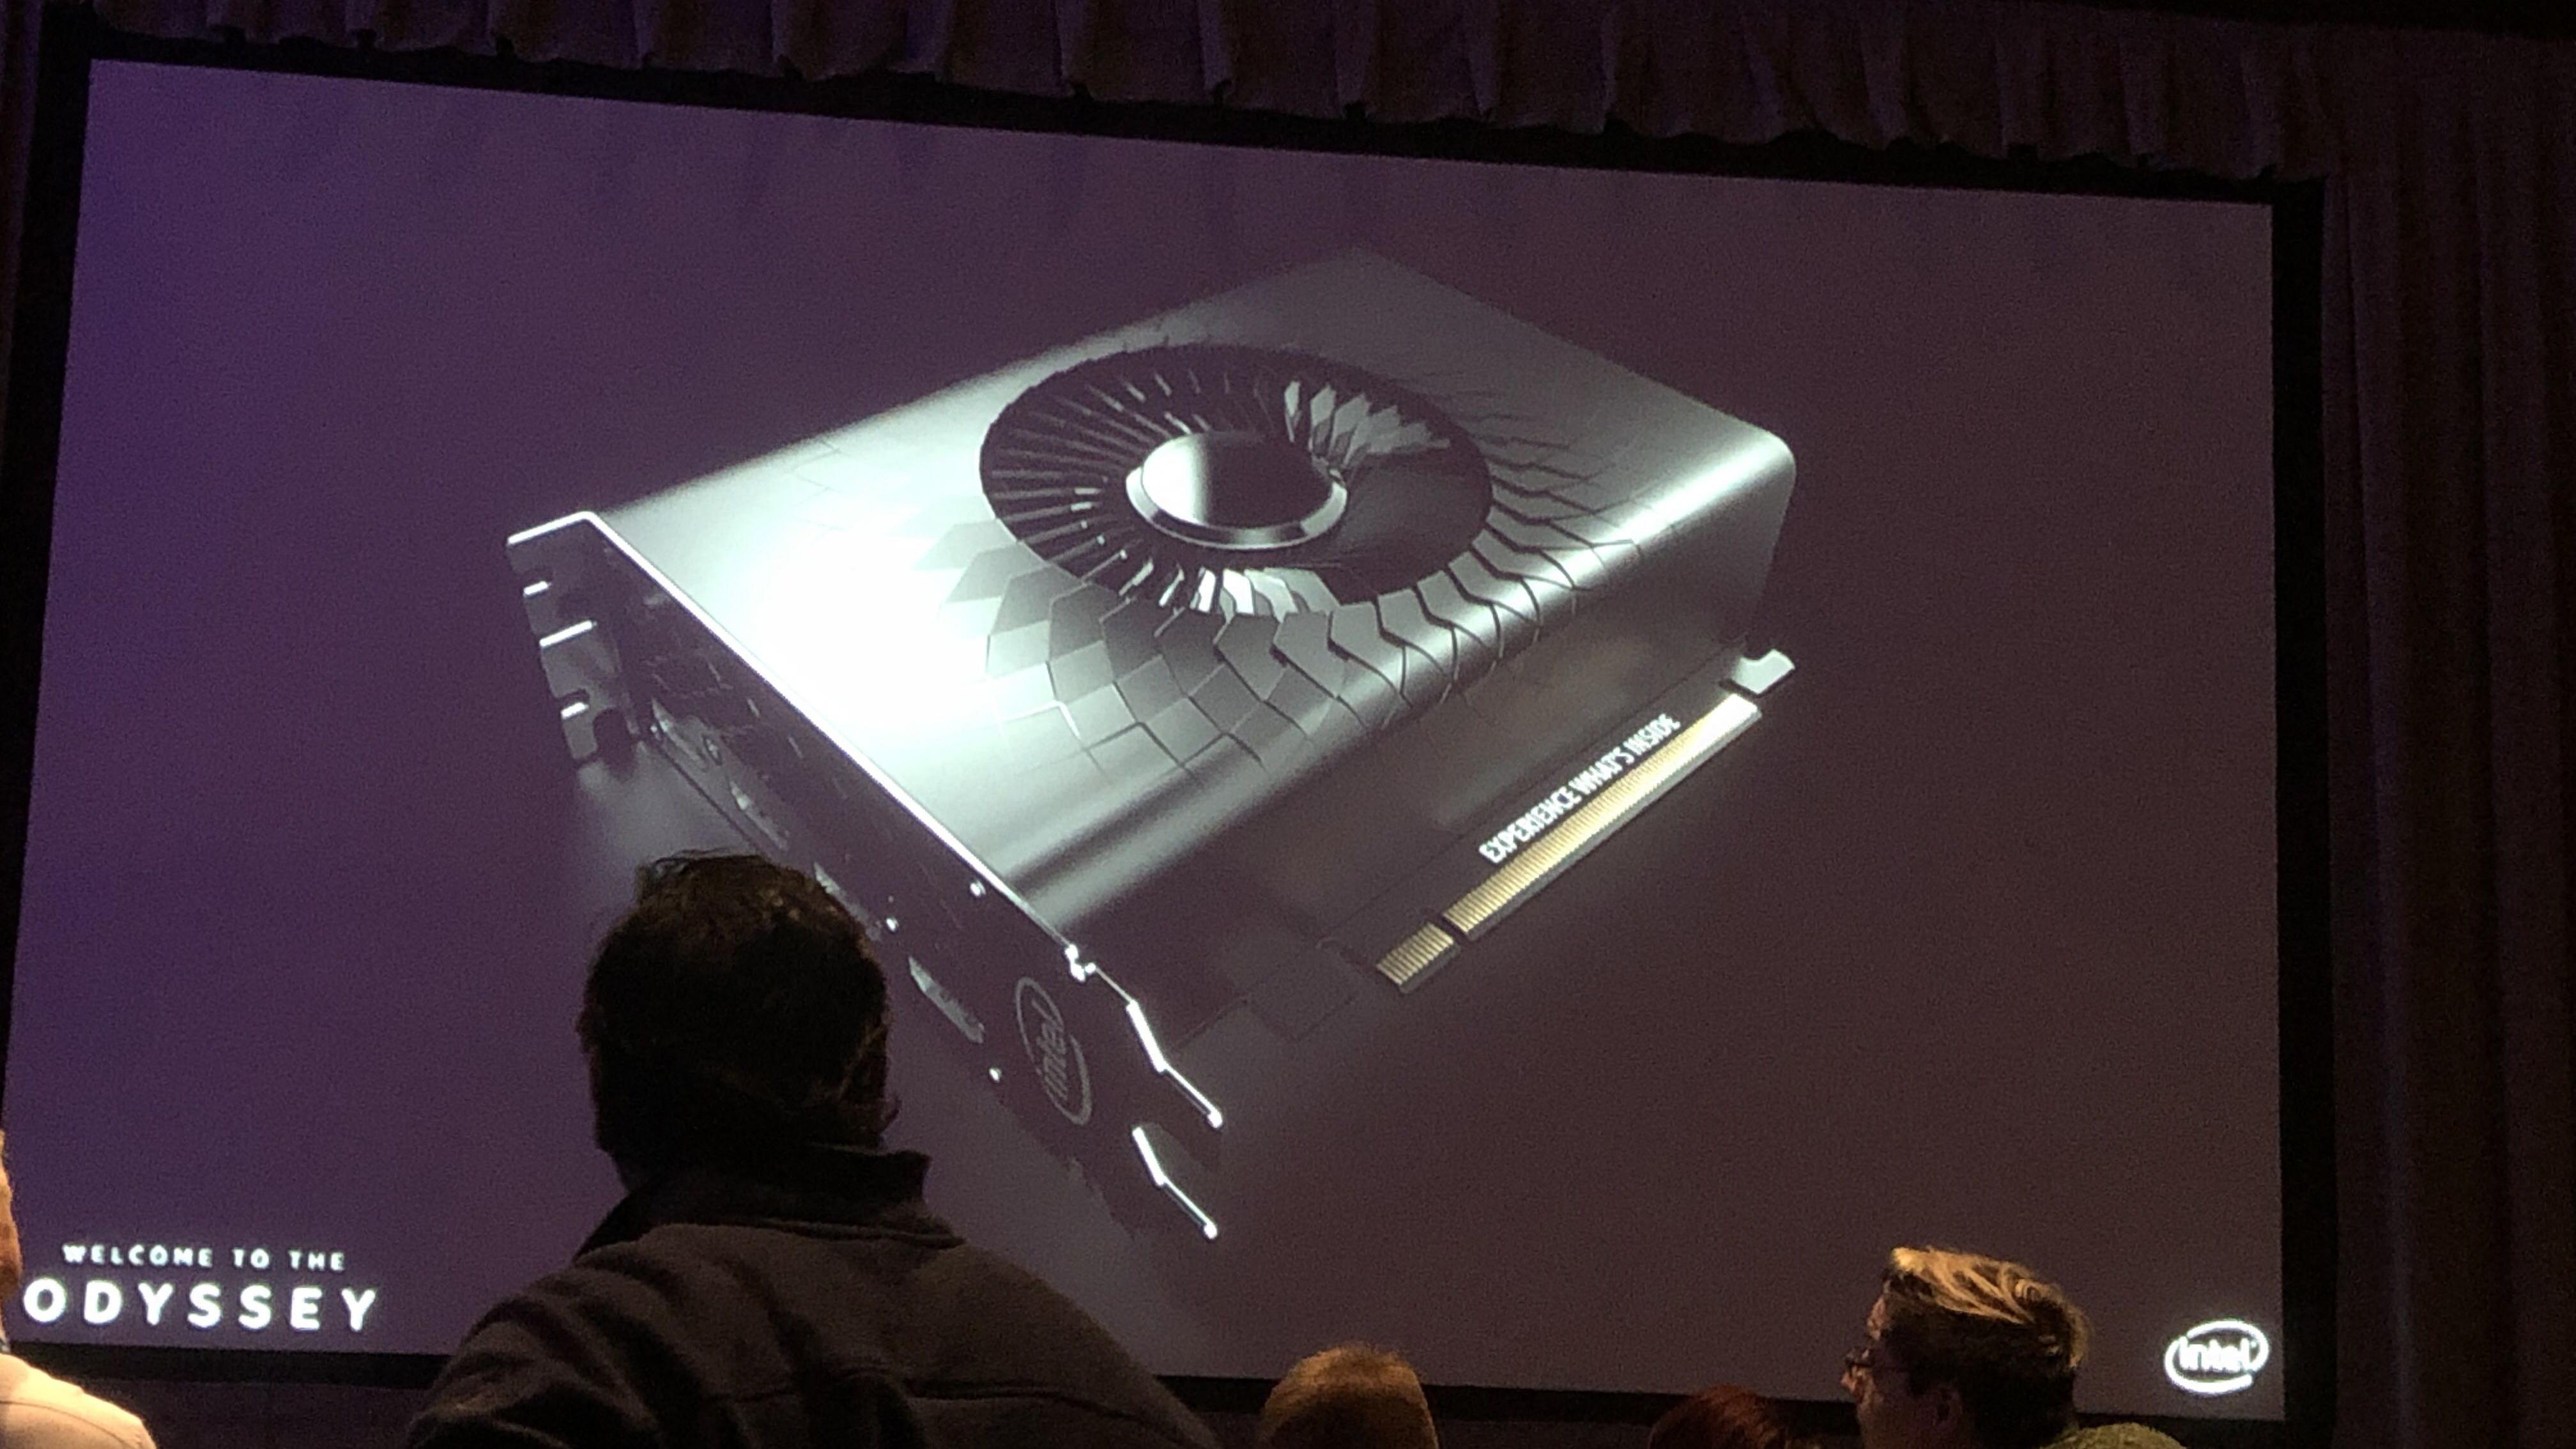 Intel Xe prototype shroud design